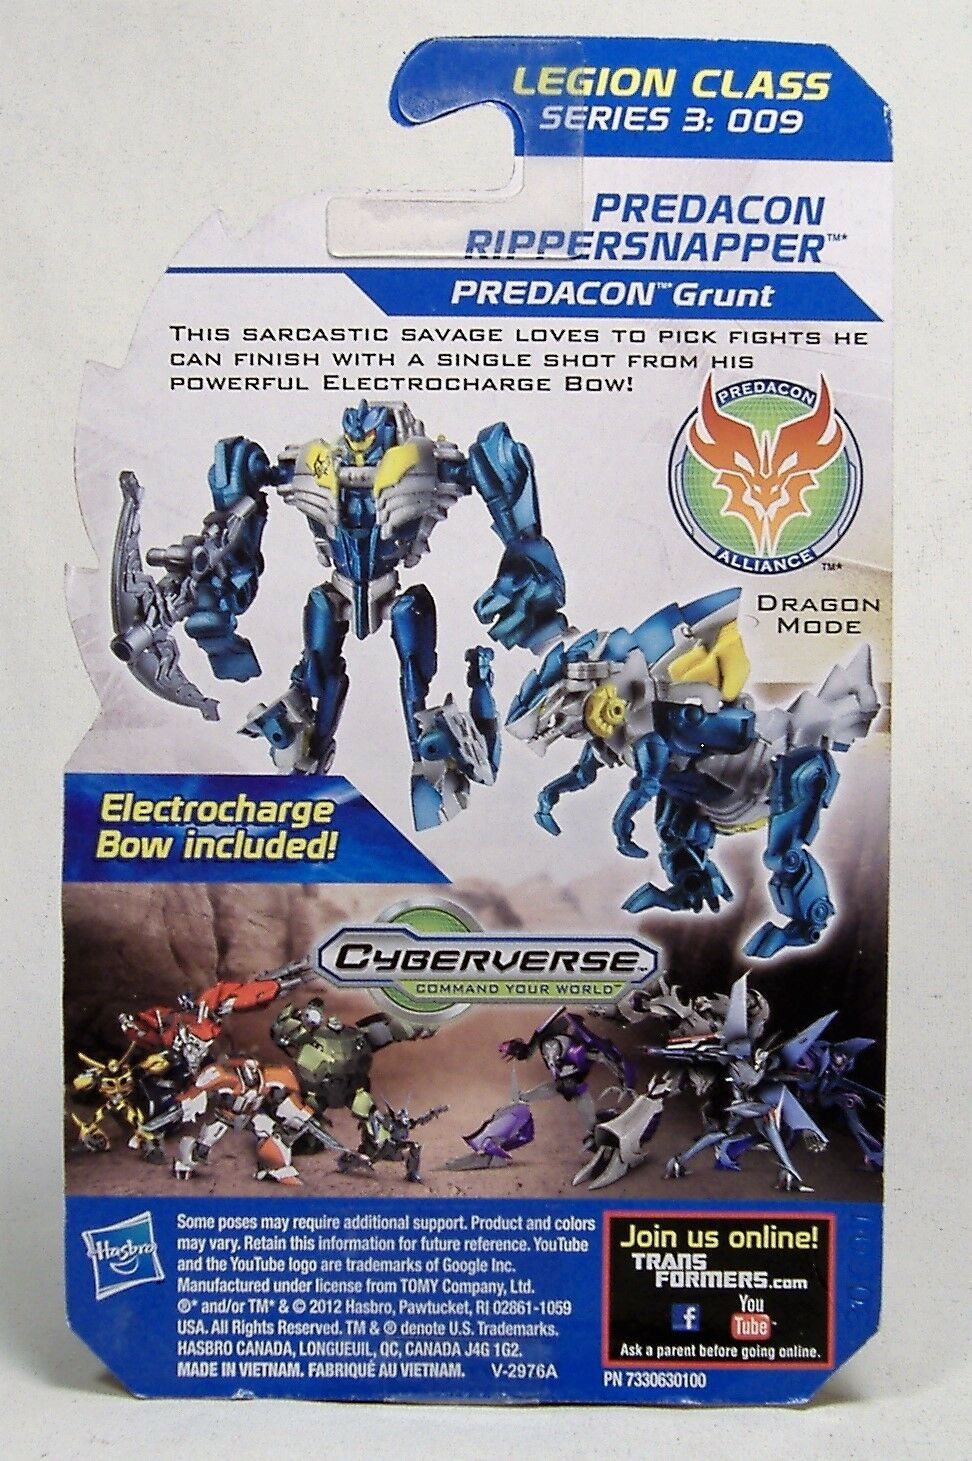 RIPPERSNAPPER Transformers Prime Beast Hunters Cyberverse Legion 2013 Abominus